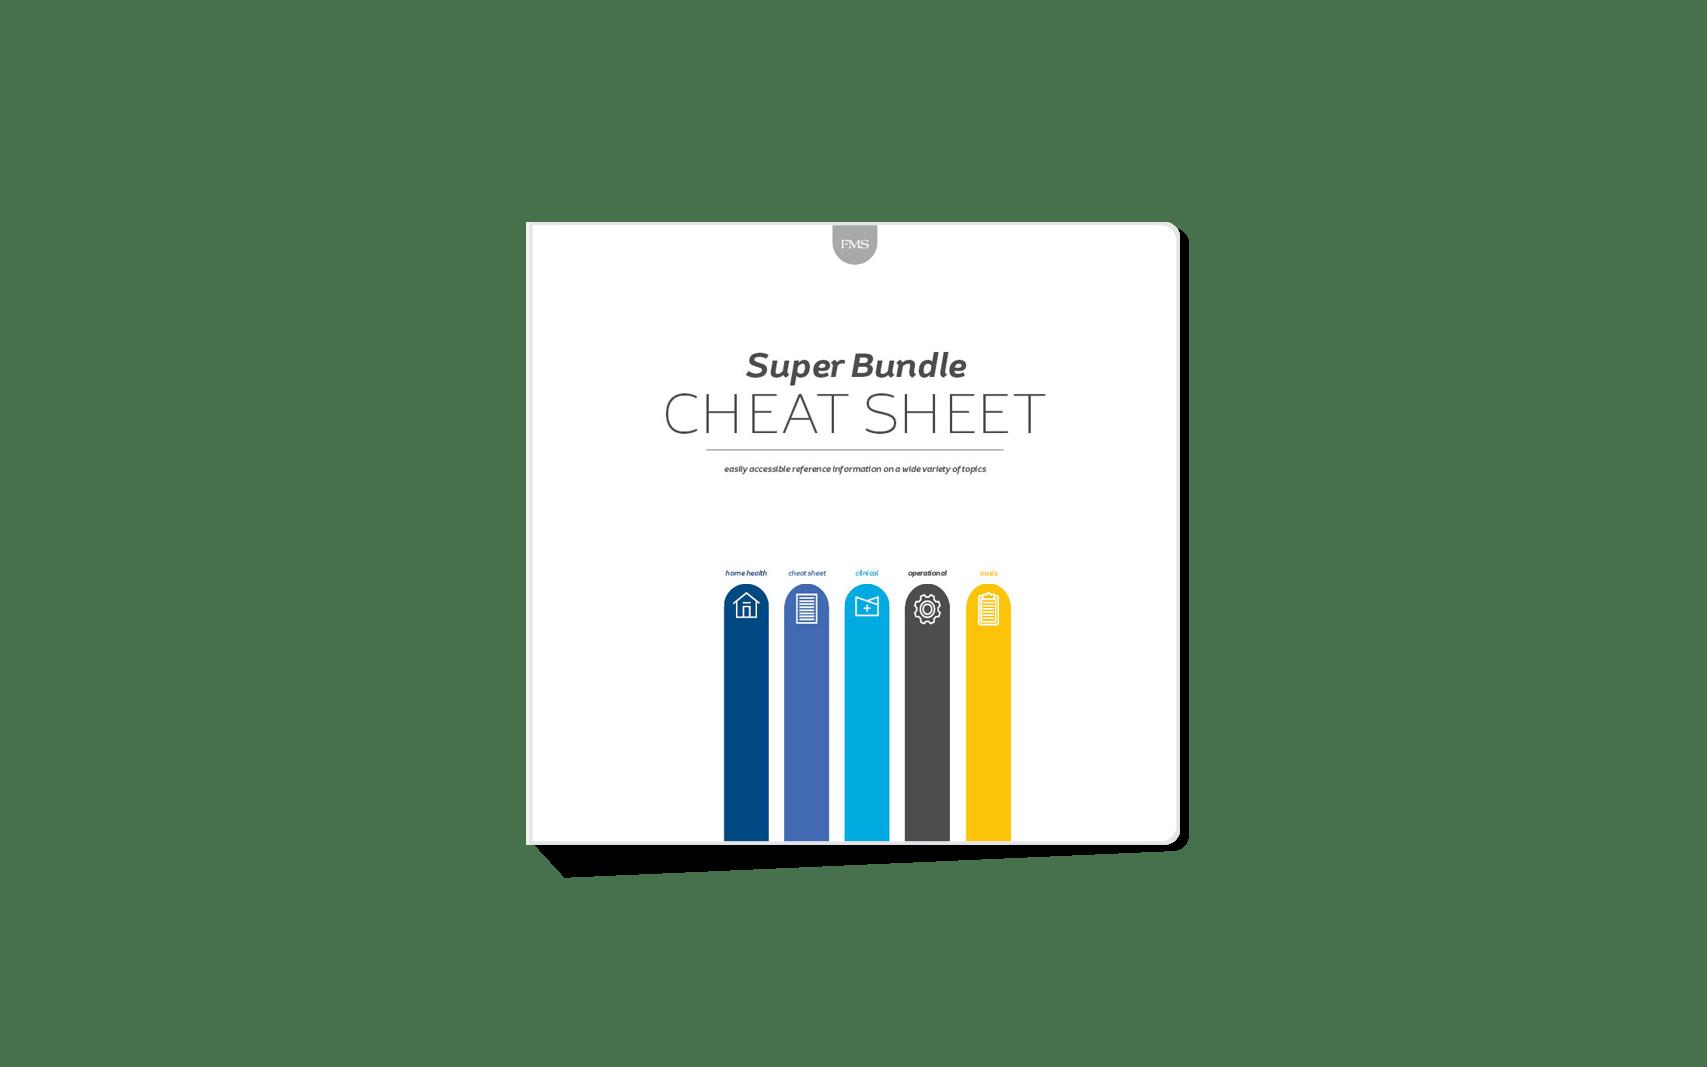 MAC Legacy (formerly FMS) Cheat Sheet Super Bundle